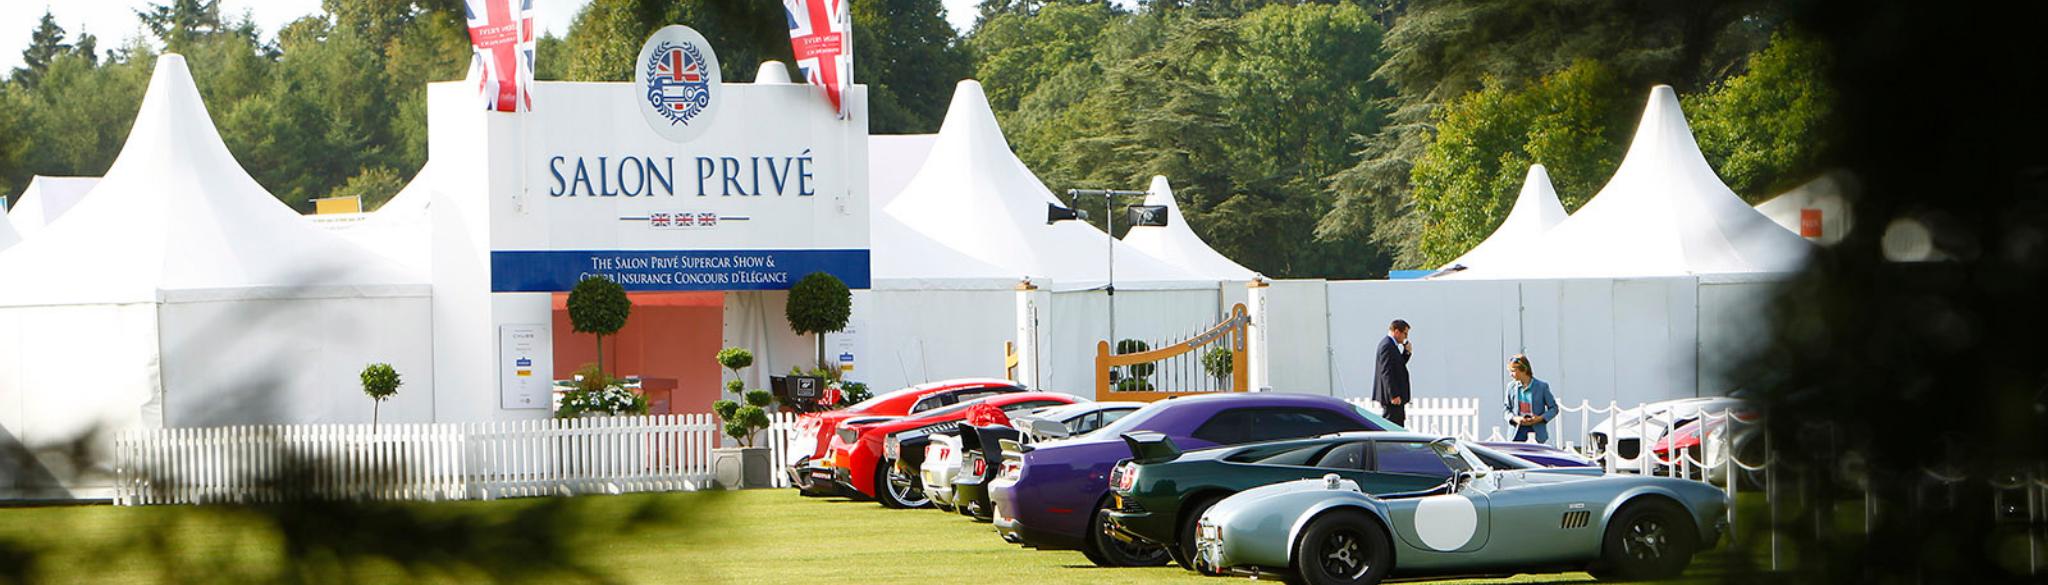 Salon Prive Car Show